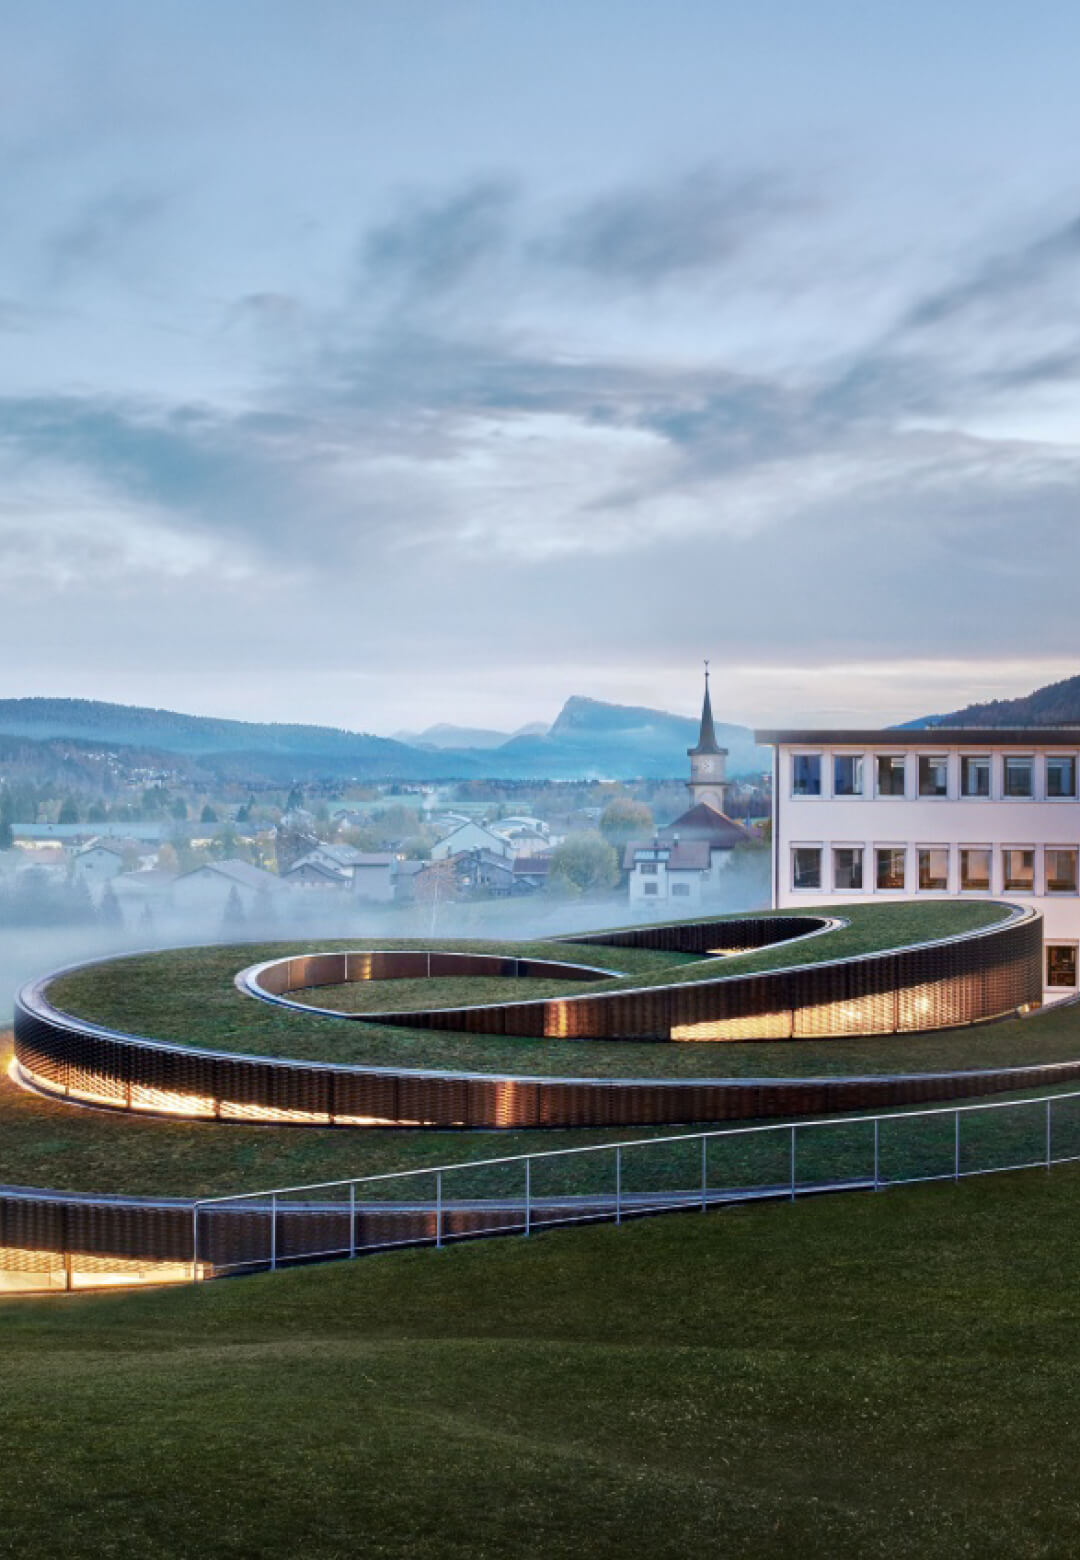 Bjarke Ingels Group has designed the Musée Atelier Audemars Piguet in Switzerland | Bjarke Ingels Group builds Musée Atelier Audemars Piguet | STIRworld